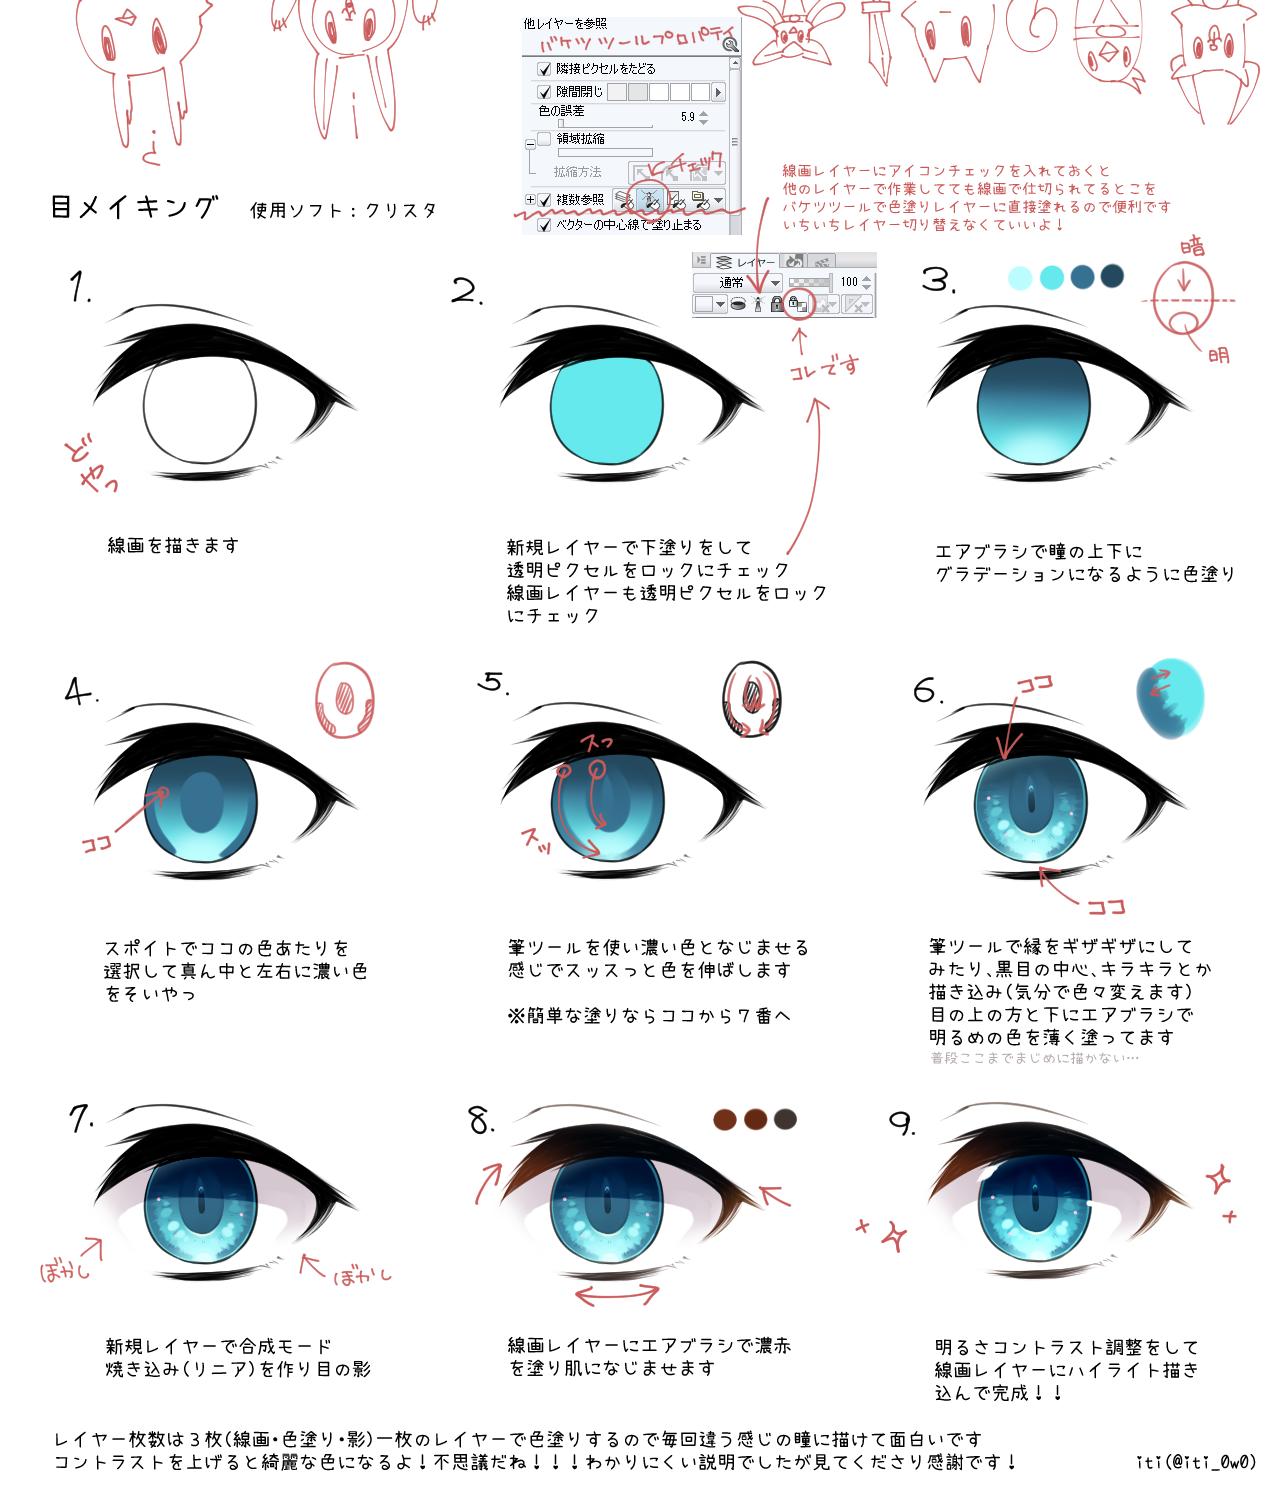 anime eyes Digital painting tutorials, Eye drawing